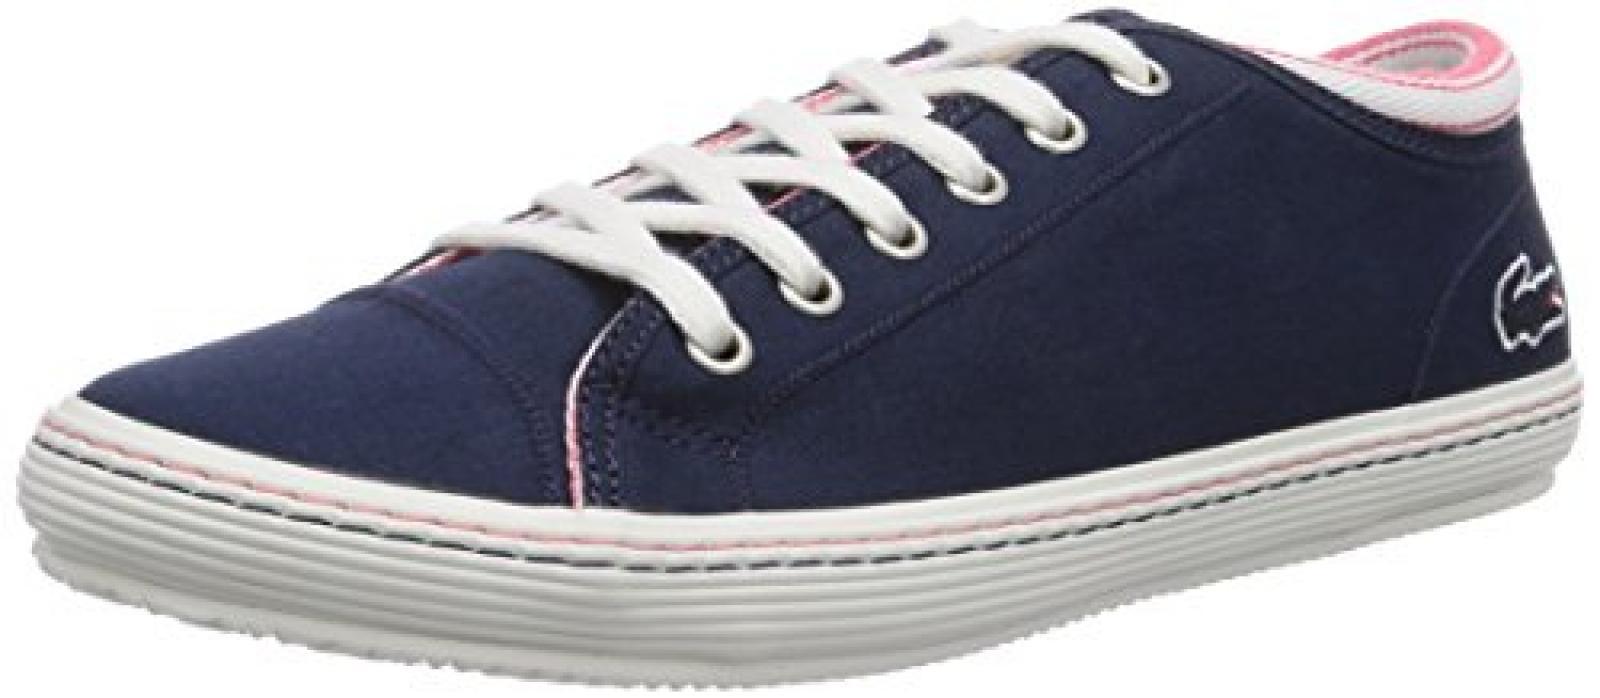 Lacoste SHORE 8 AP Damen Sneakers